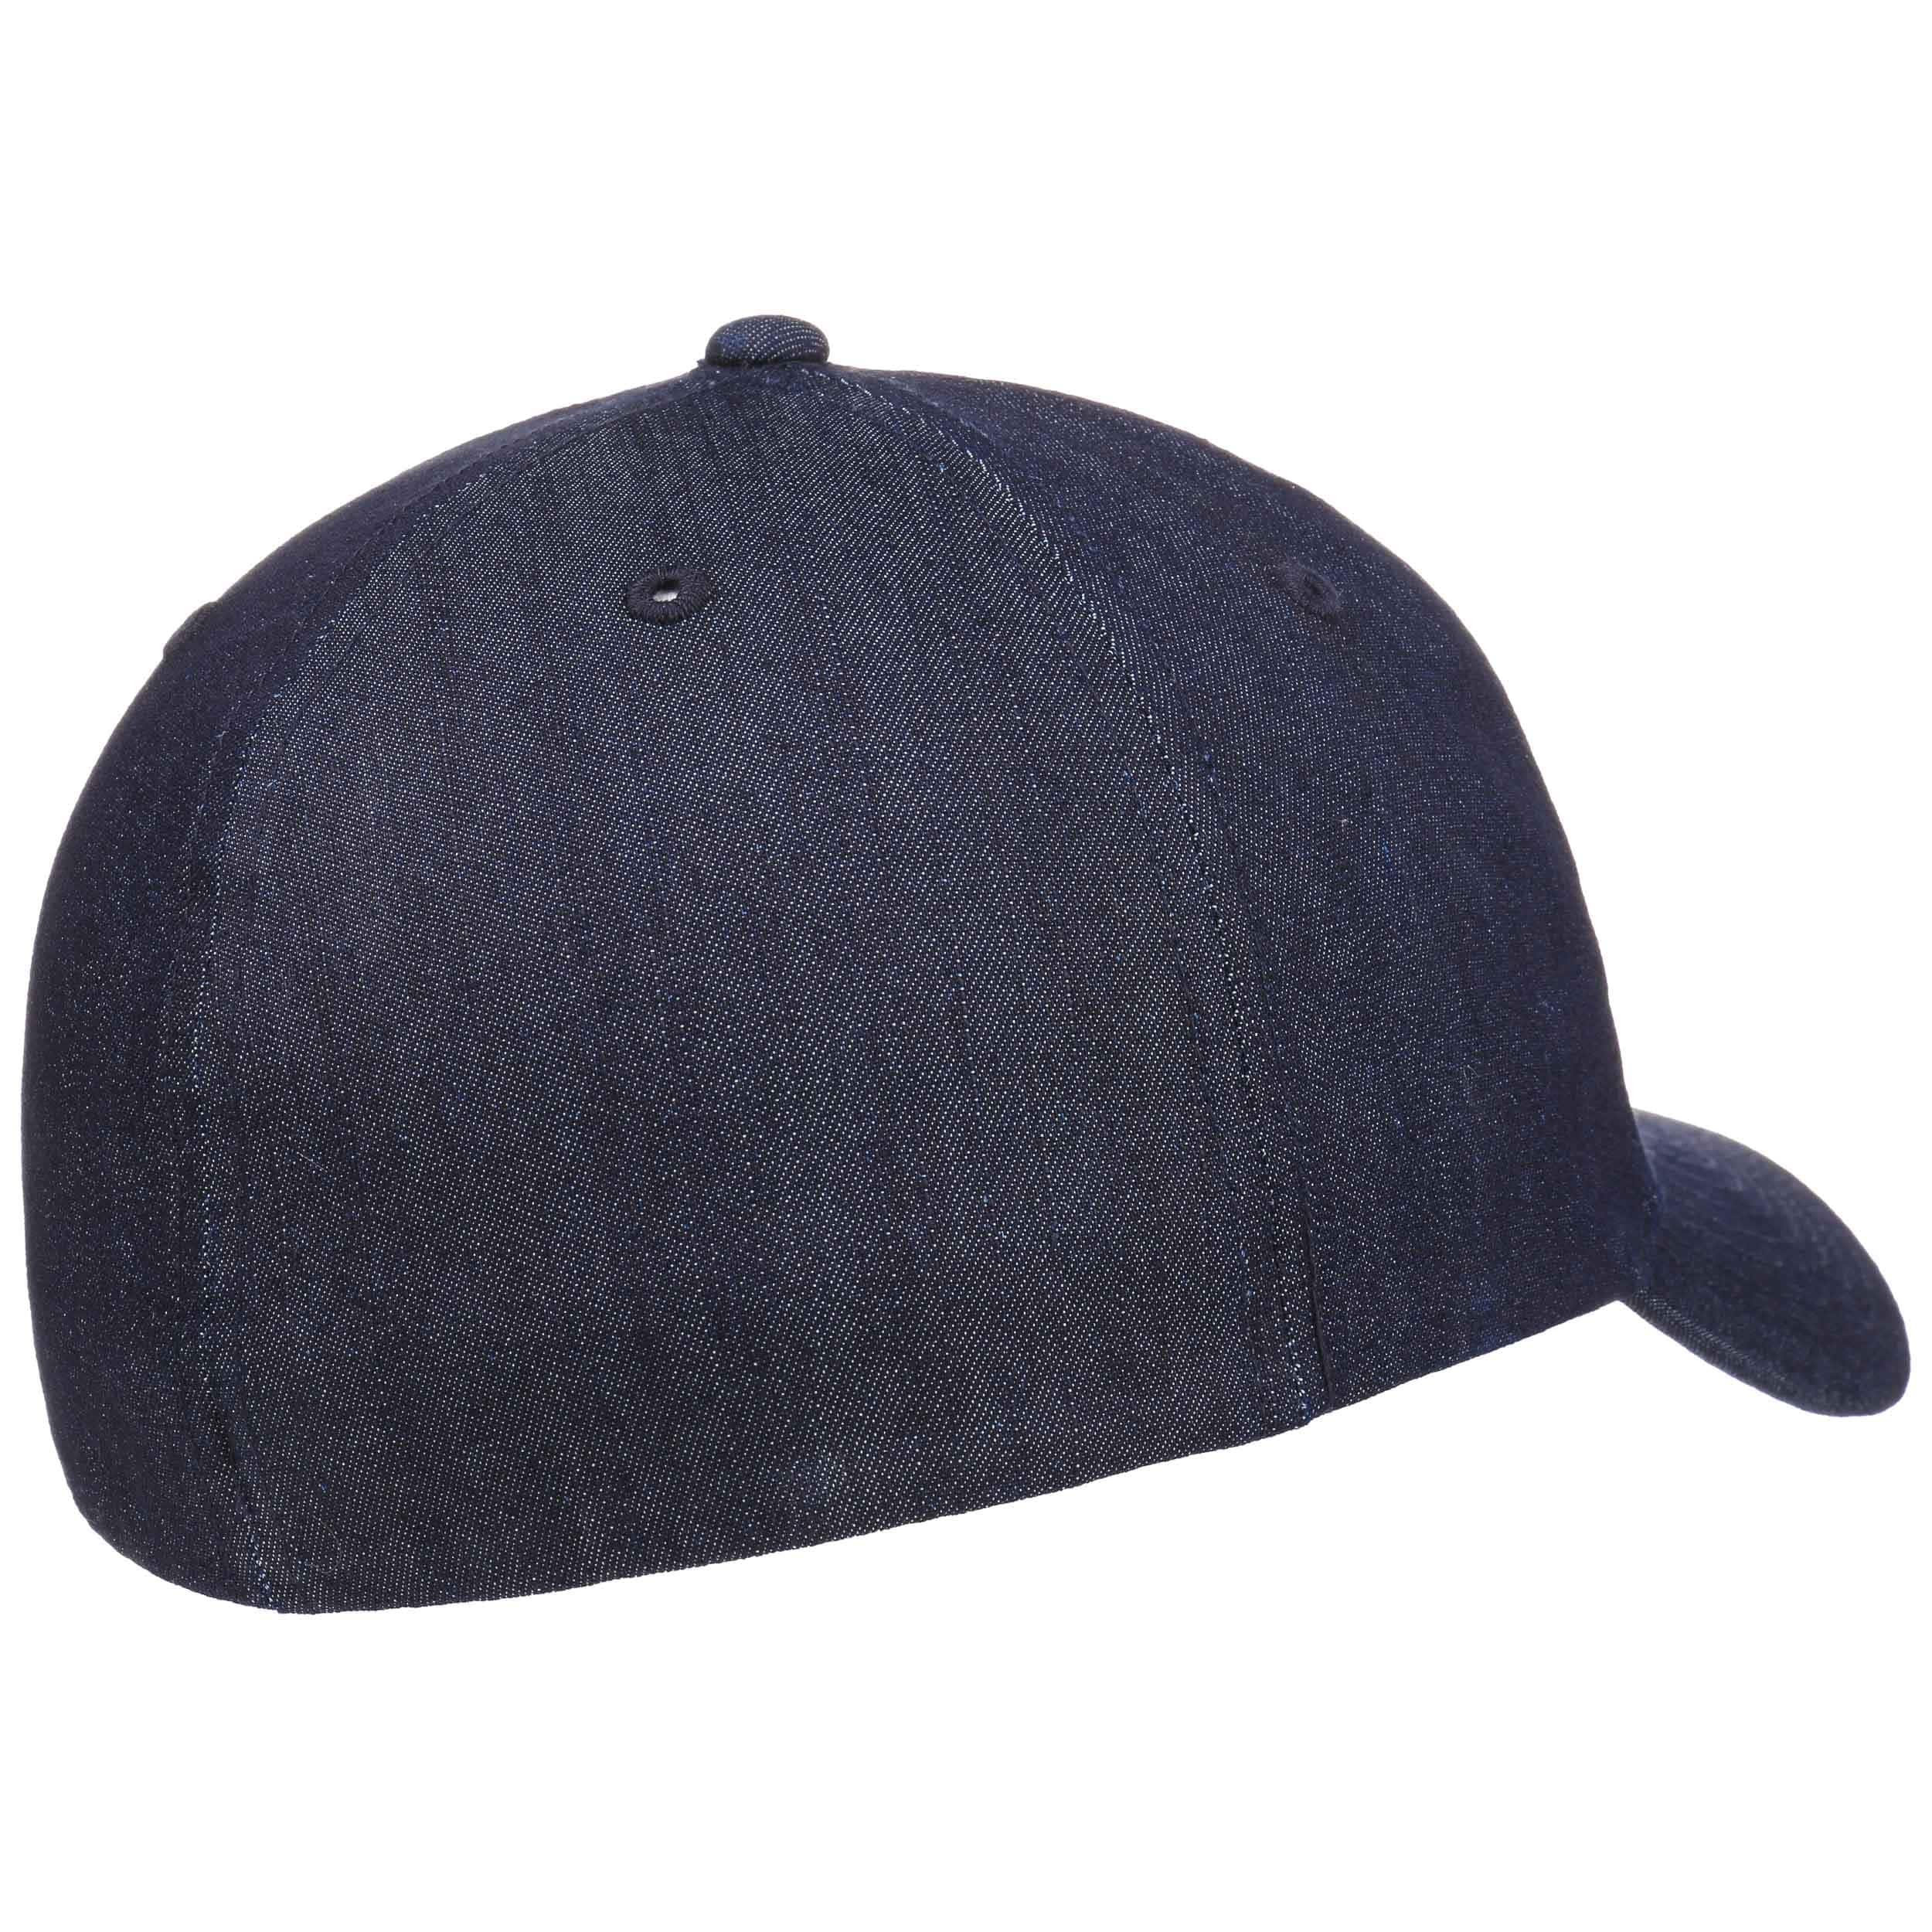 Gorra de Béisbol Flexfit Denim by Kangol - Gorras - sombreroshop.es 65d181891a1